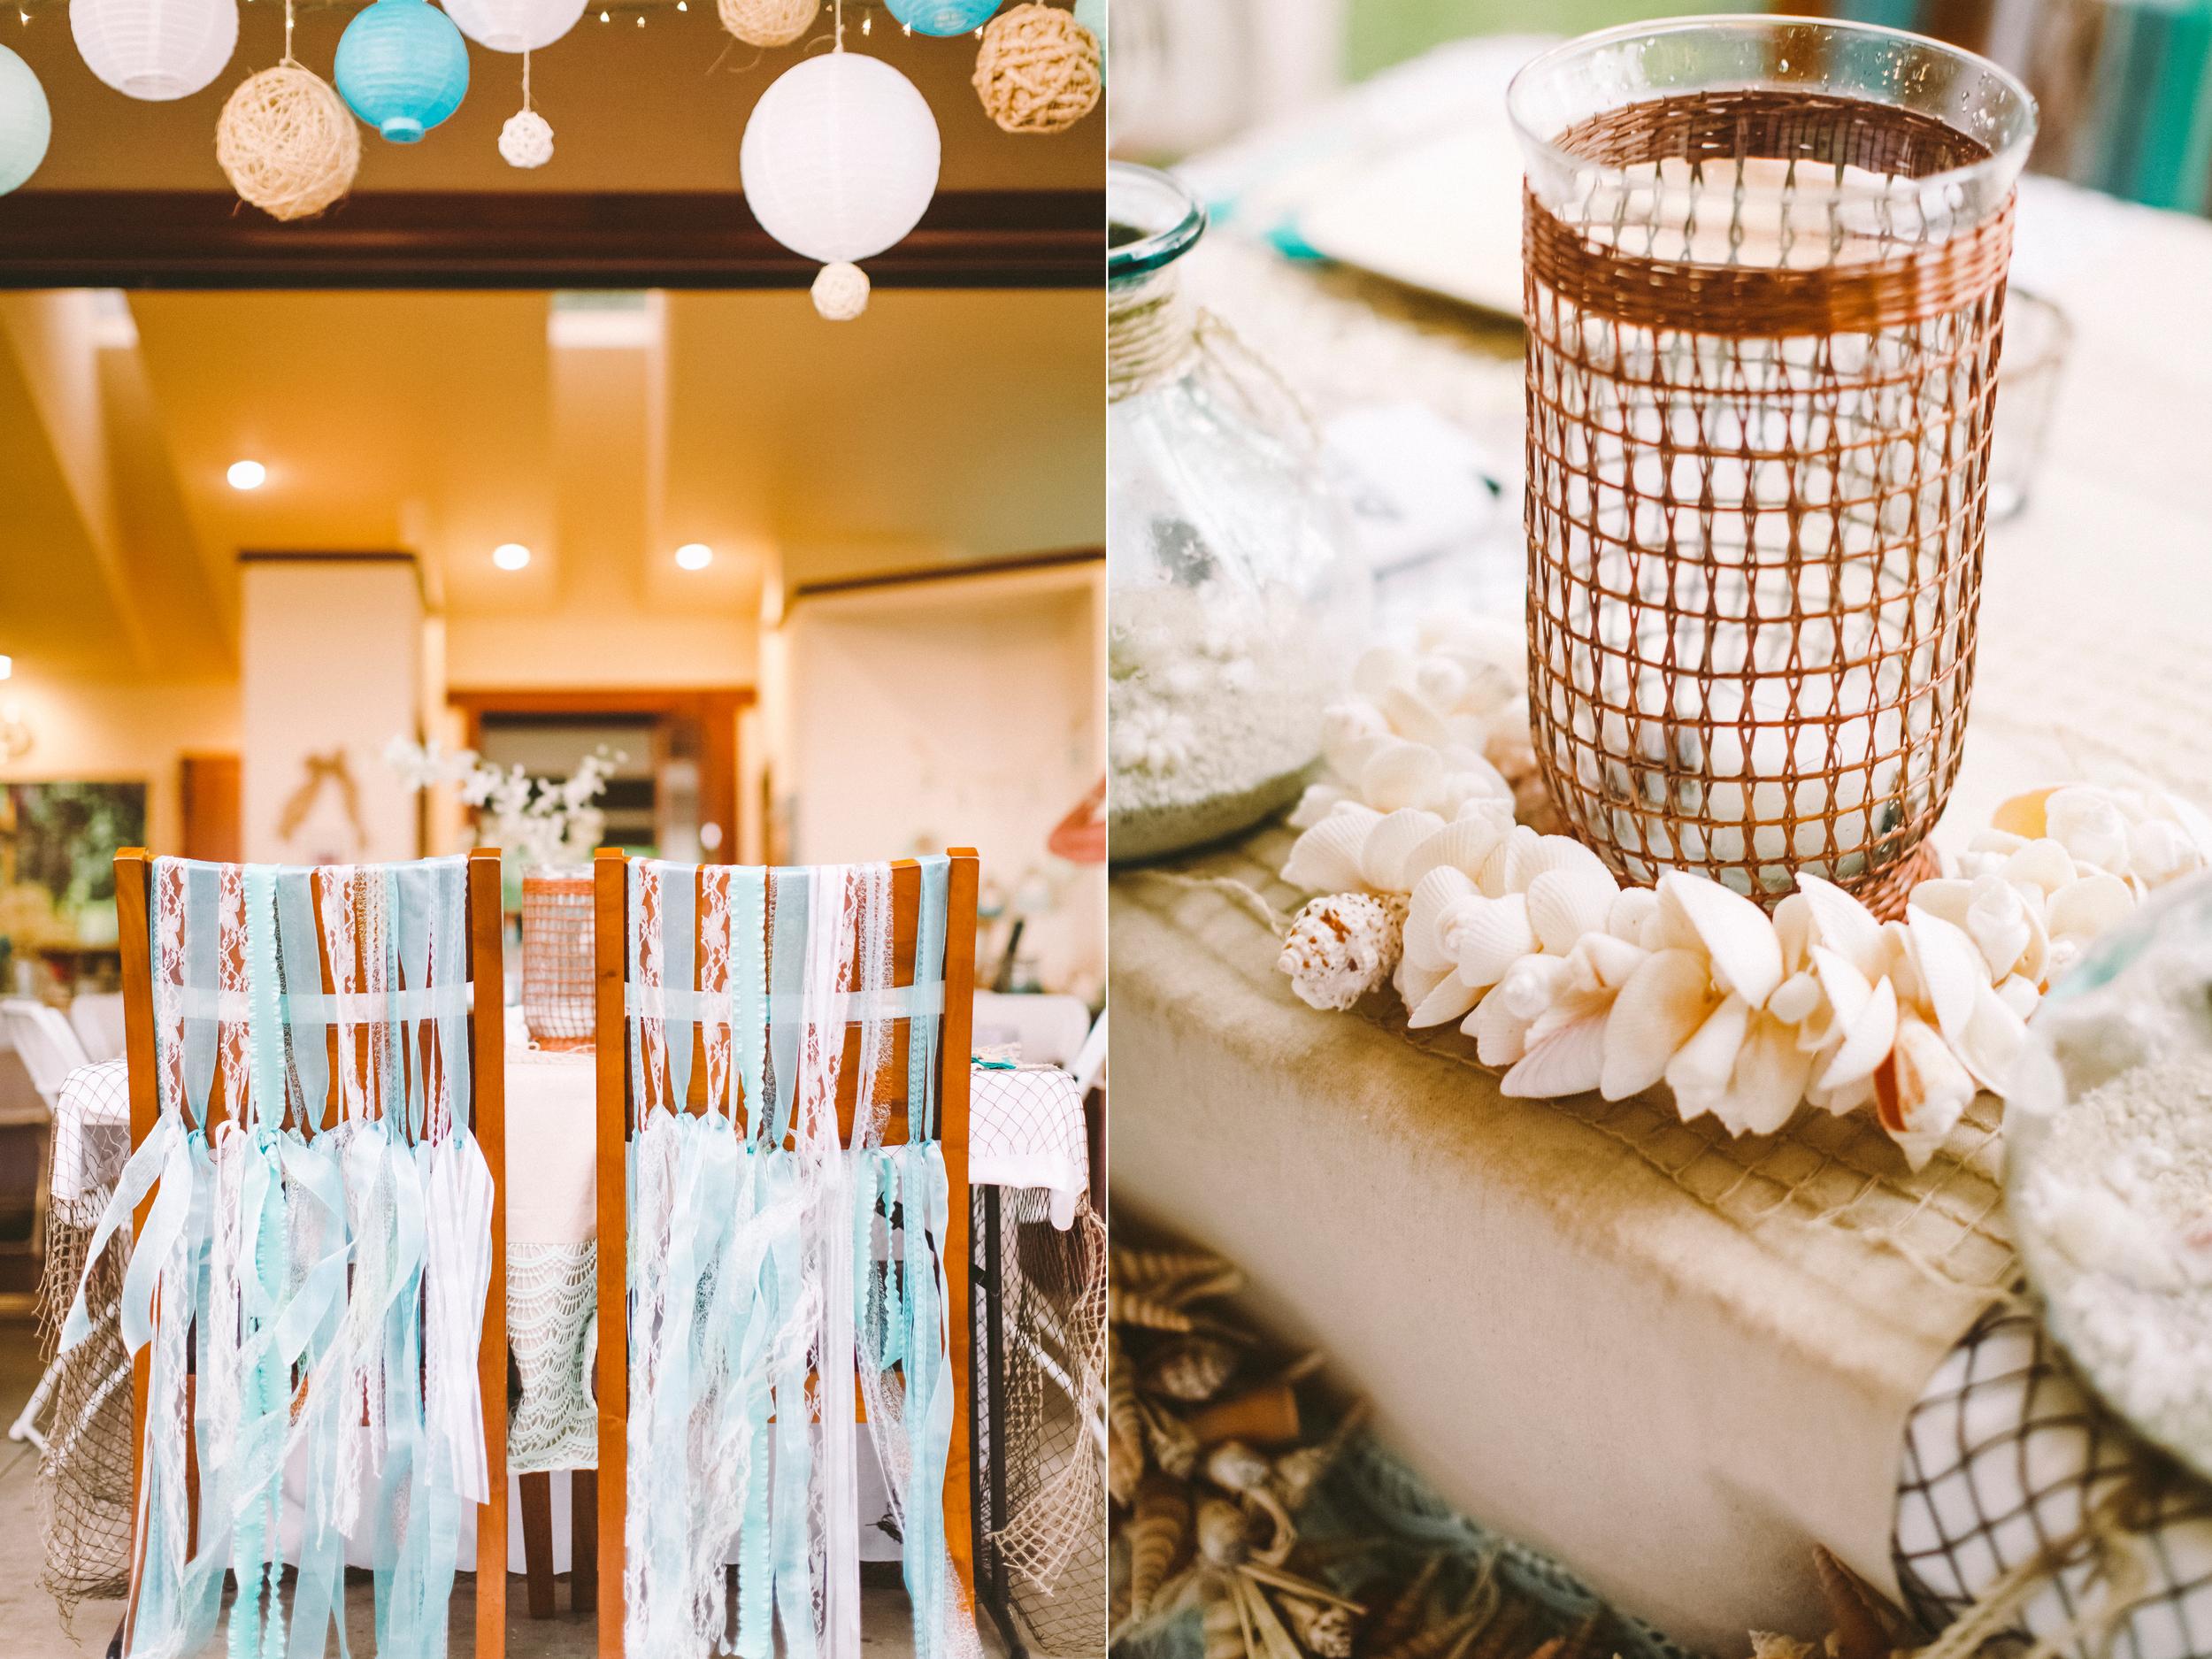 angie-diaz-photography-hawaii-wedding-photographer-kelli-jay-110.jpg